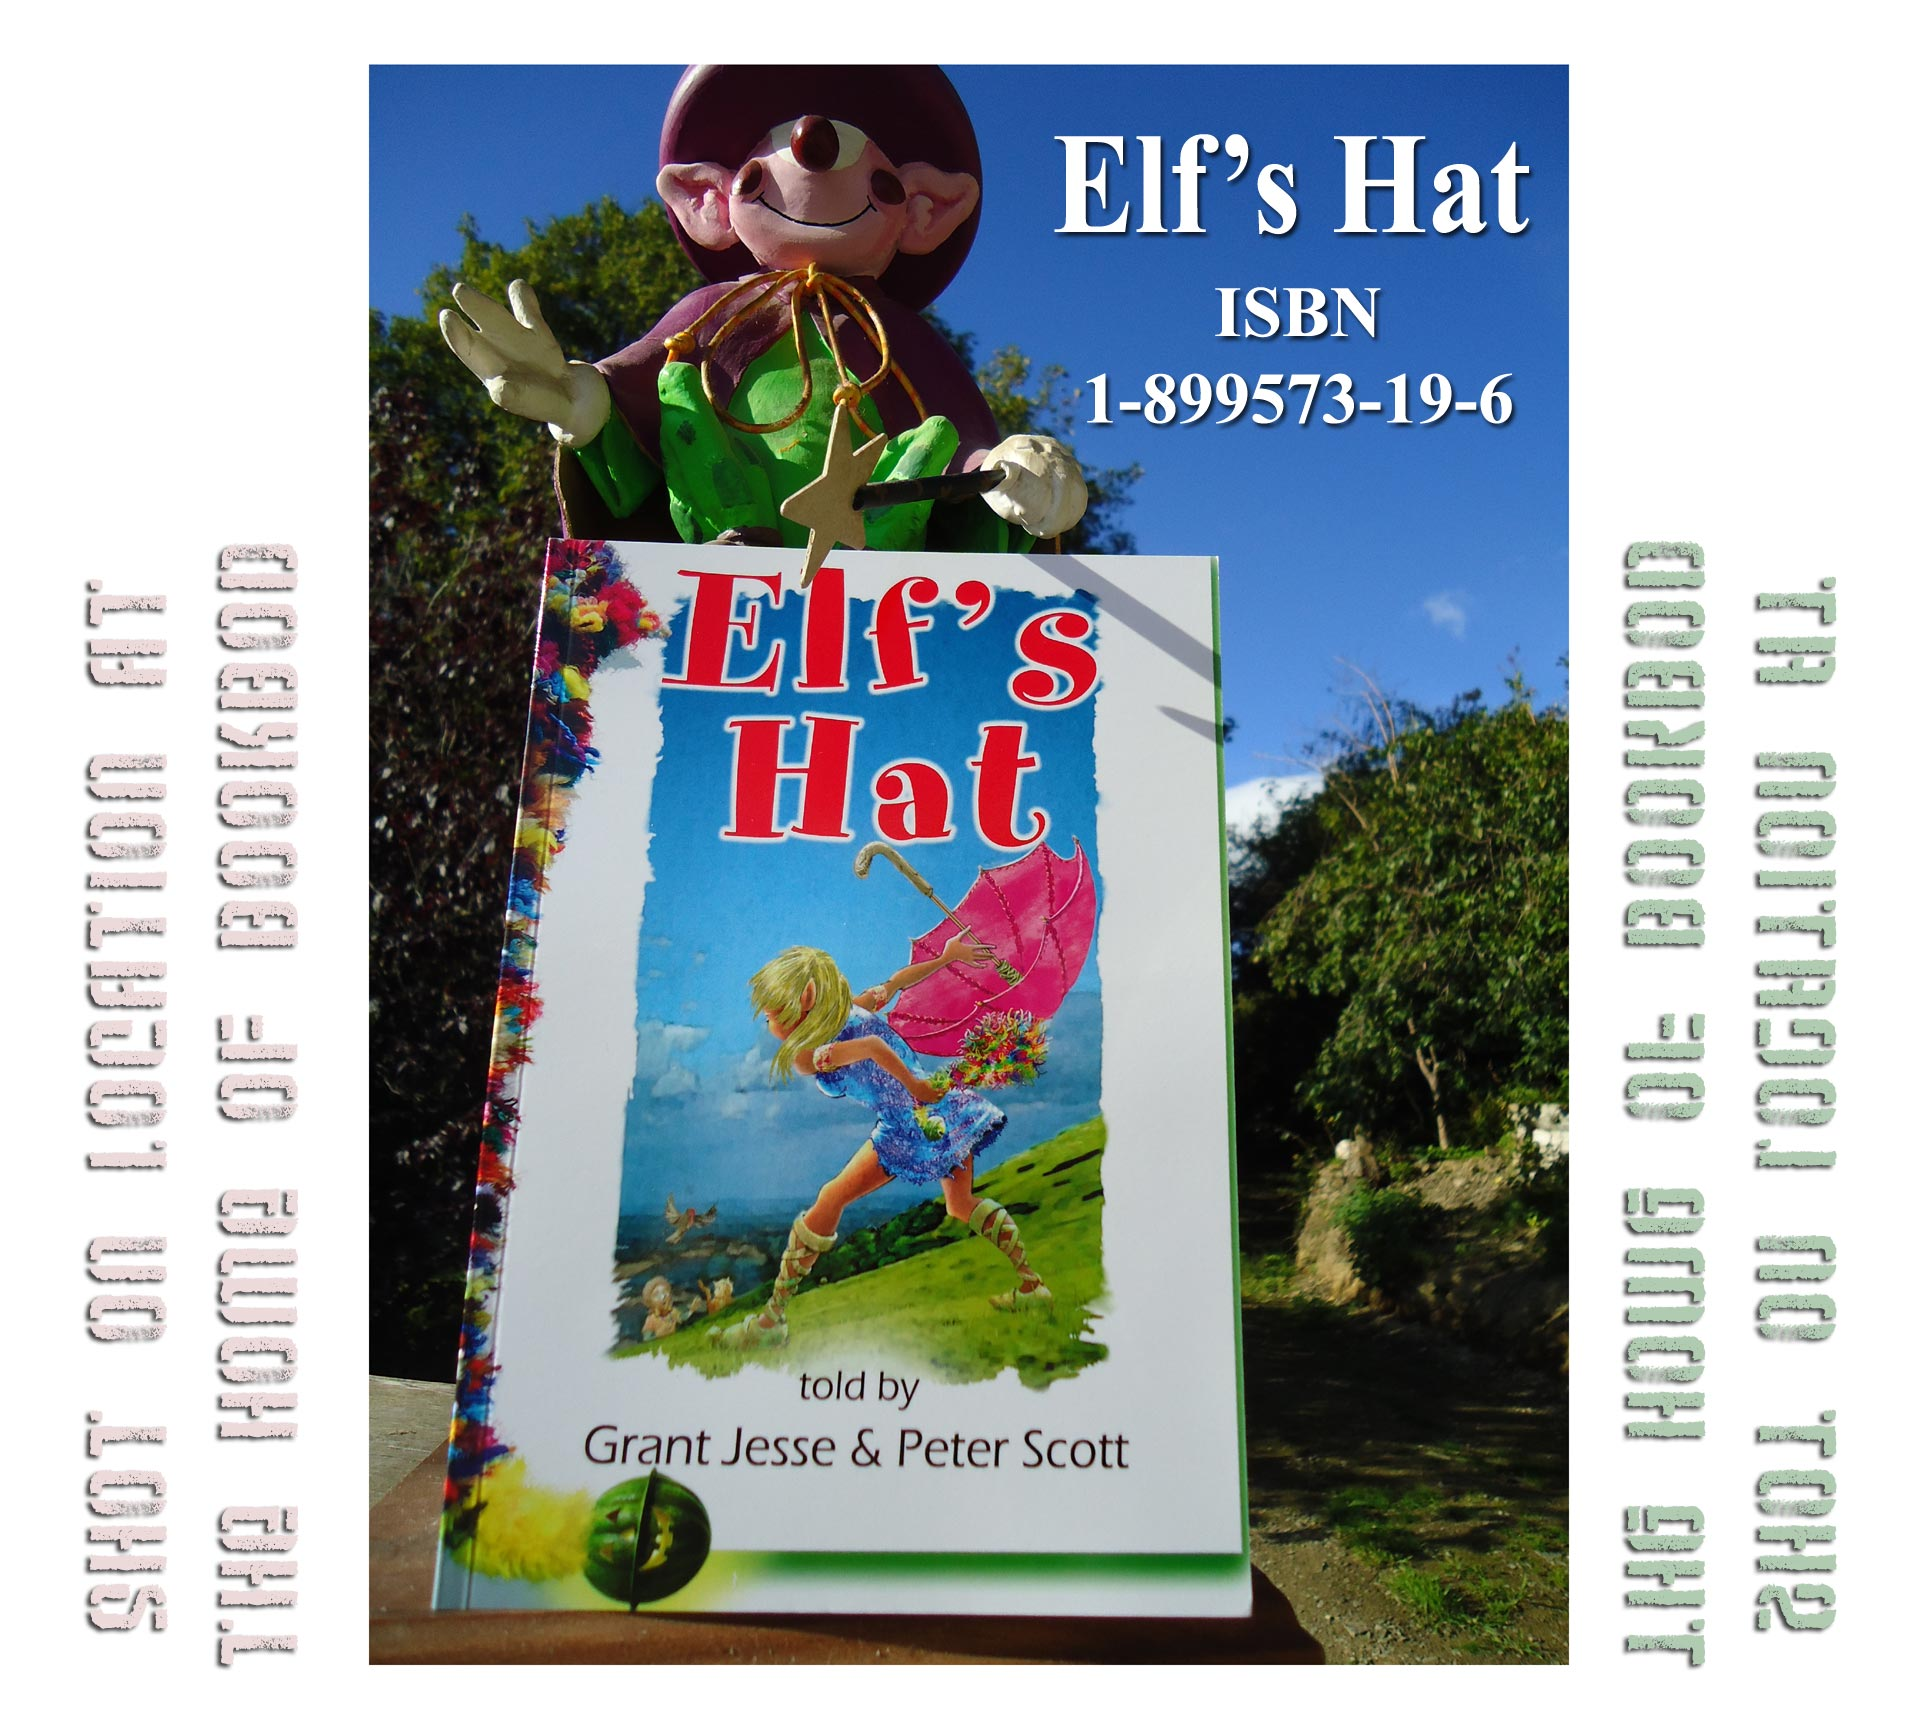 Elf's Hat